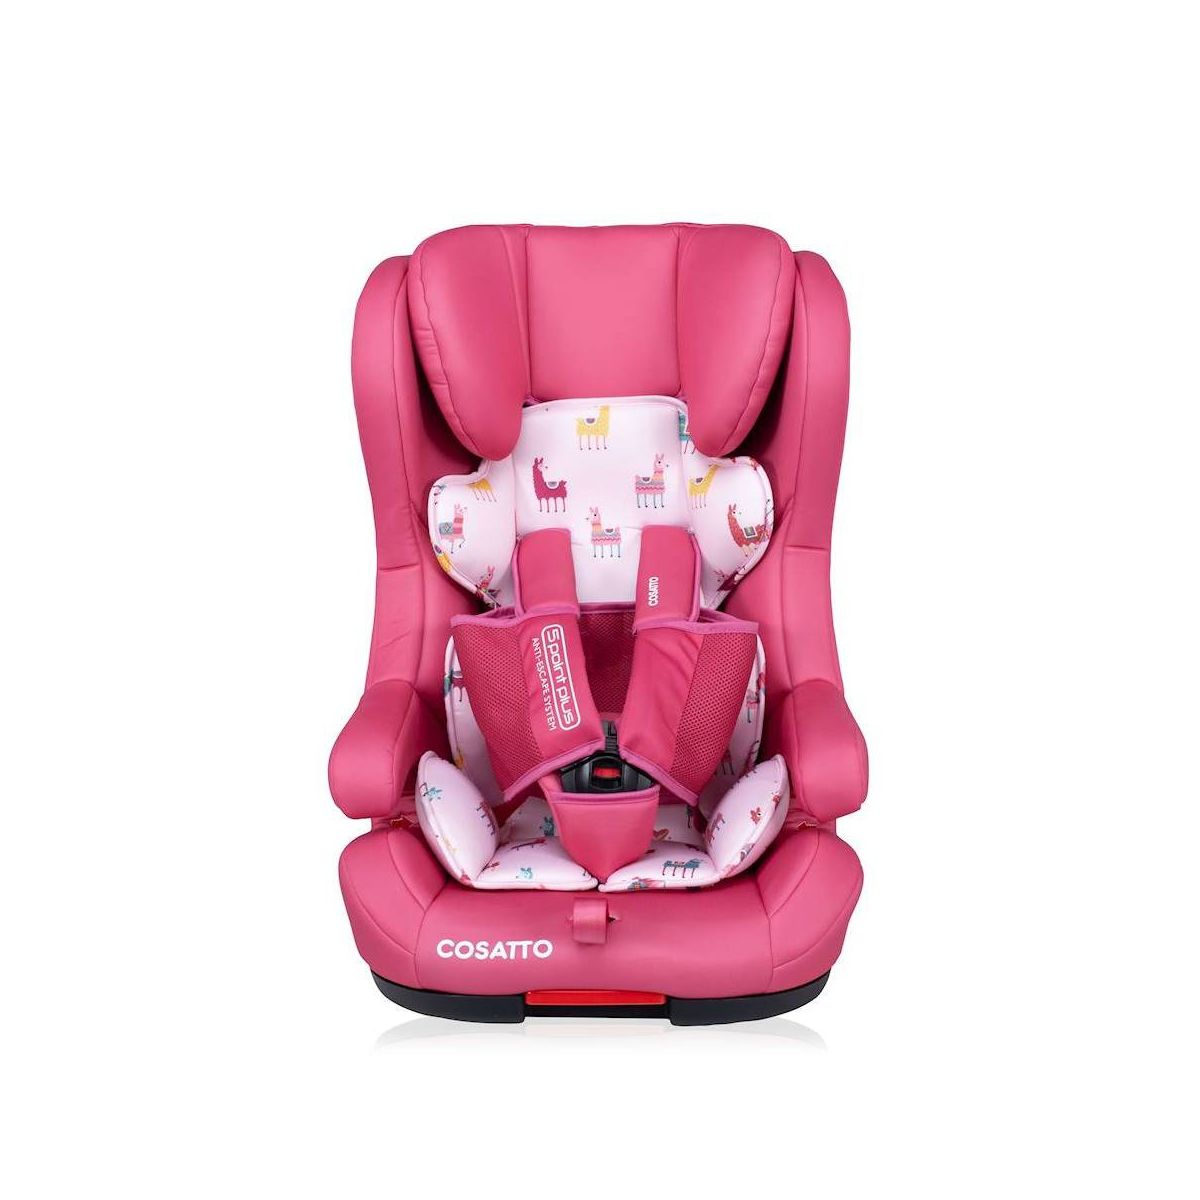 Cosatto Hubbub (5 Point Plus) 1/2/3 Car Seat - Pink Llama